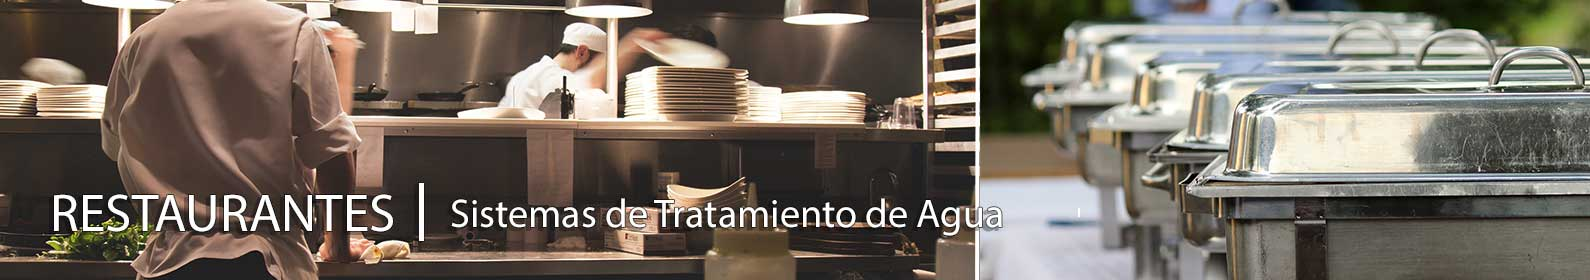 sistemas-de-tratamiento-de-agua-restaurantes..jpg